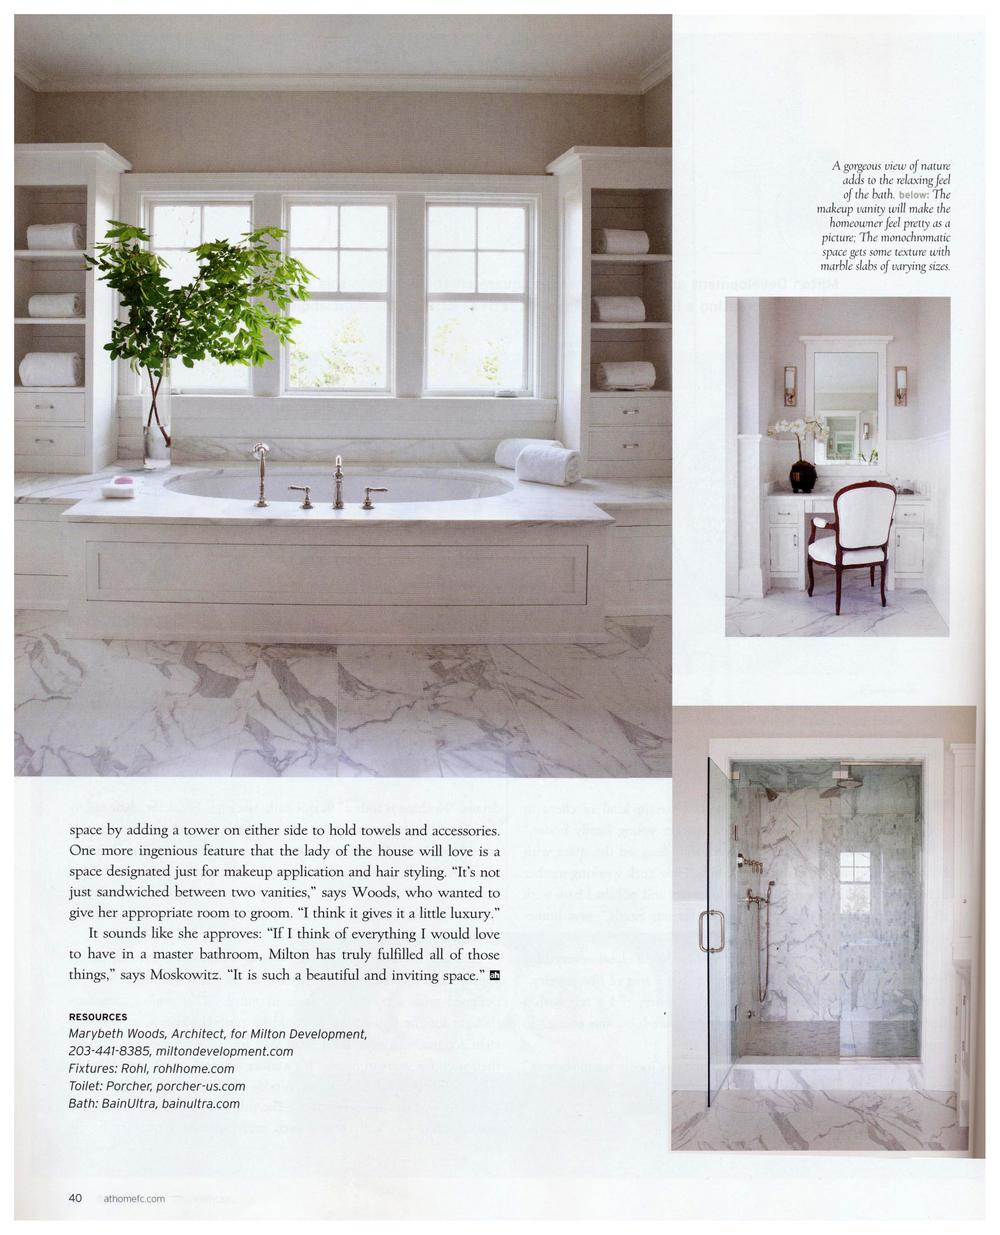 DesignEdgepage 3.jpg